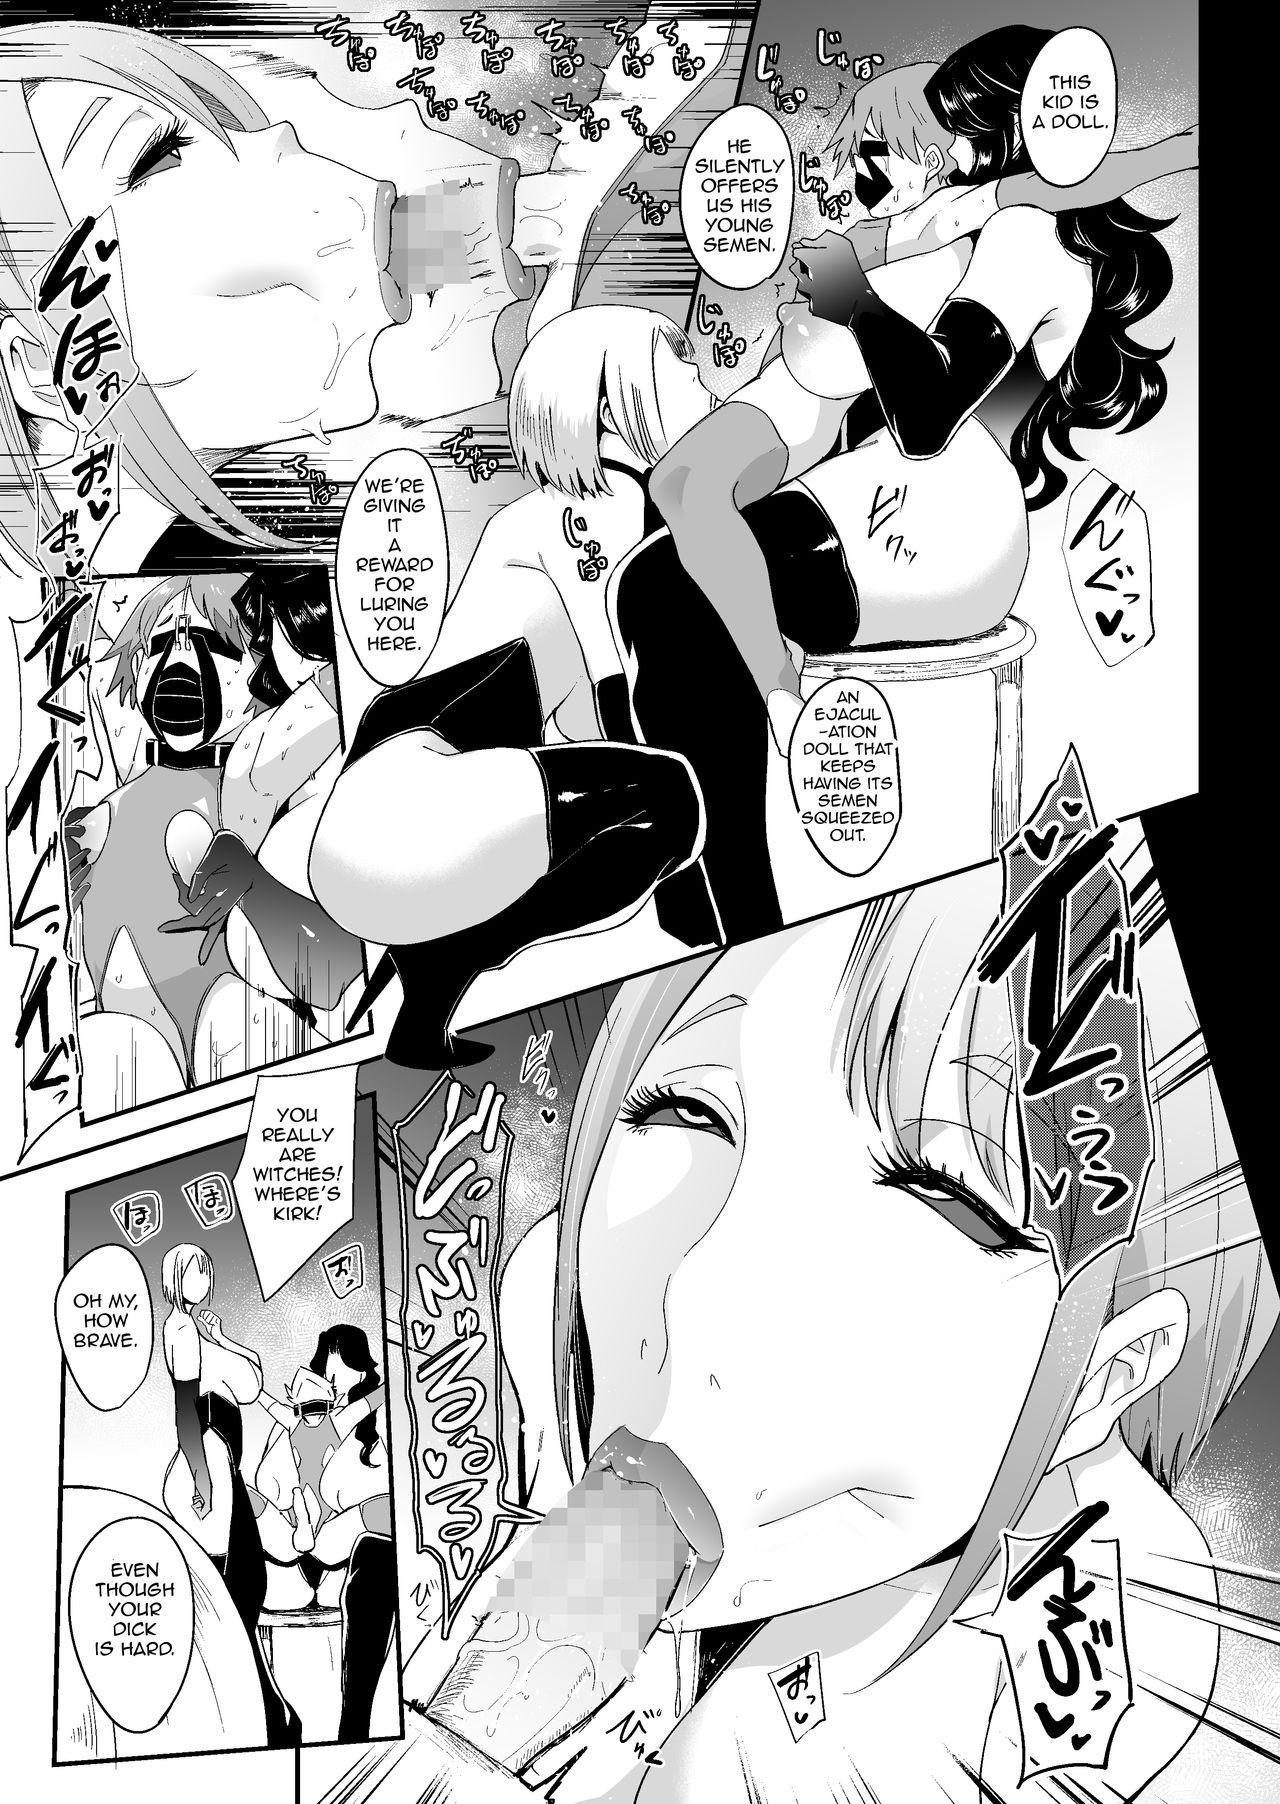 [SOUND MILK (Otochichi)] Mori no Majo - Kyousei Jinkaku Haishutsu Shasei - | Forest Witches - Forced Personality Ejection Ejaculation - [English] [Jormangander] 11